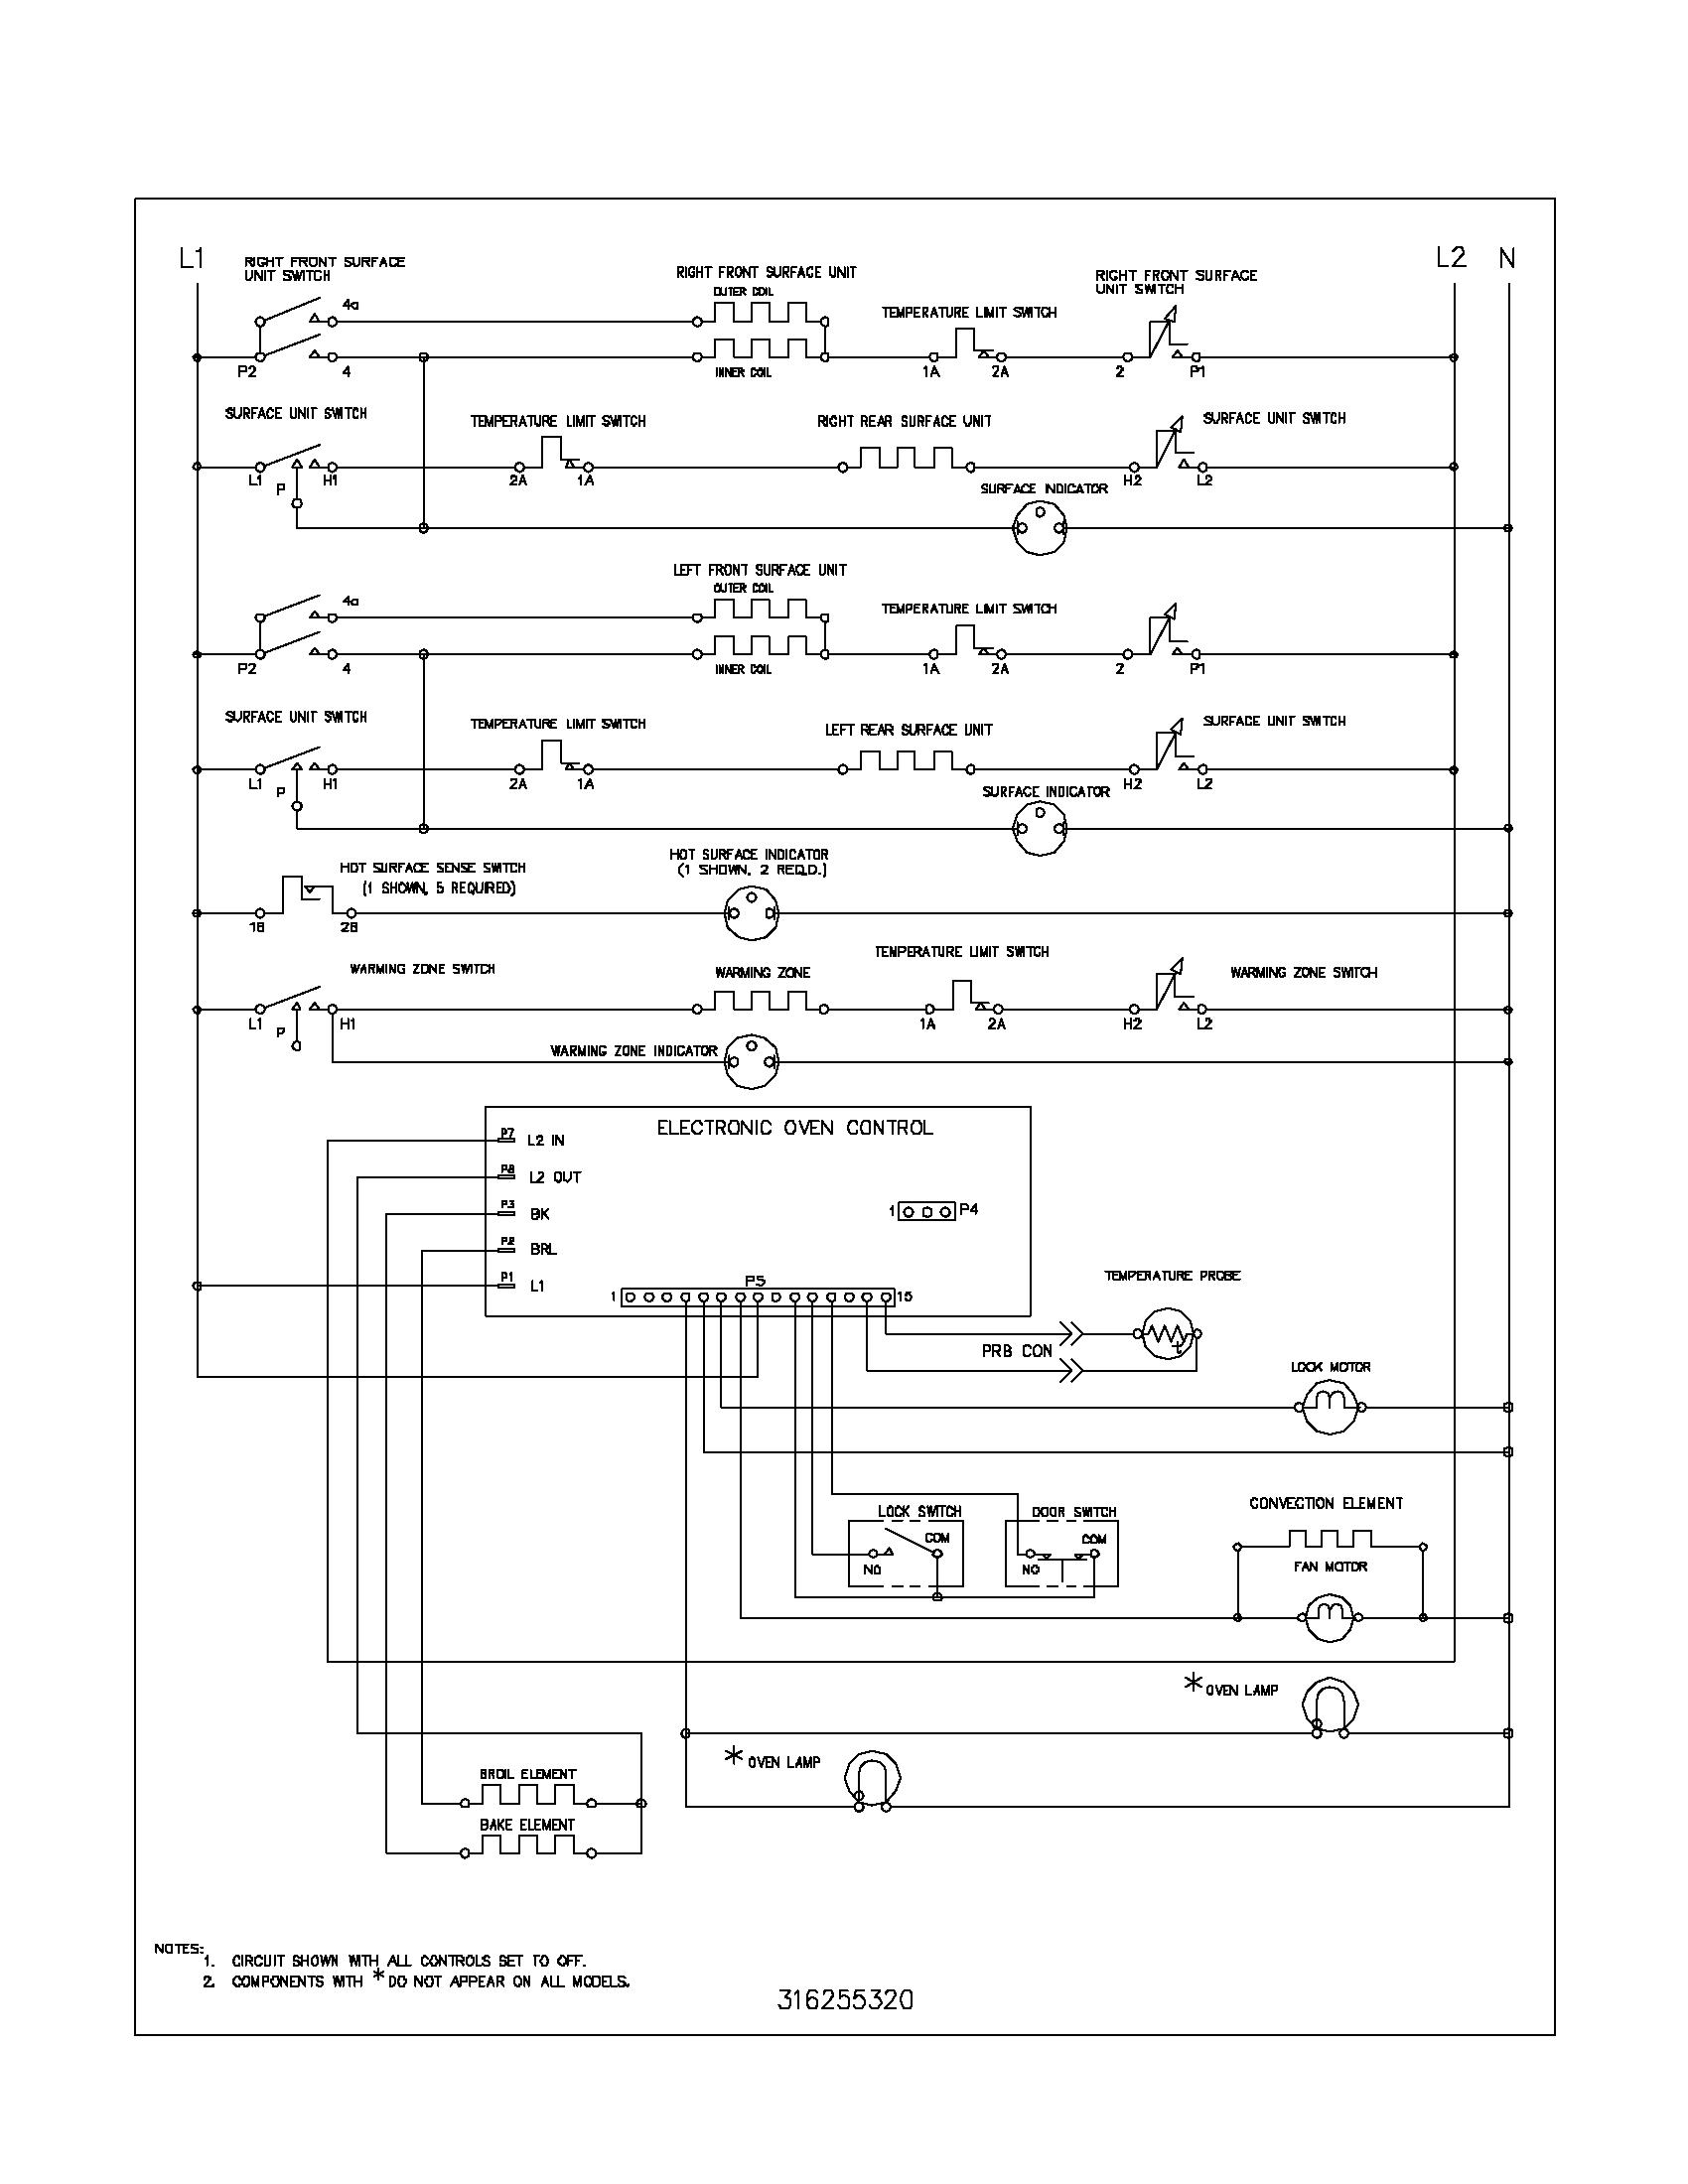 Whirlpool Gas Dryer Repair Manual He3t Schematic